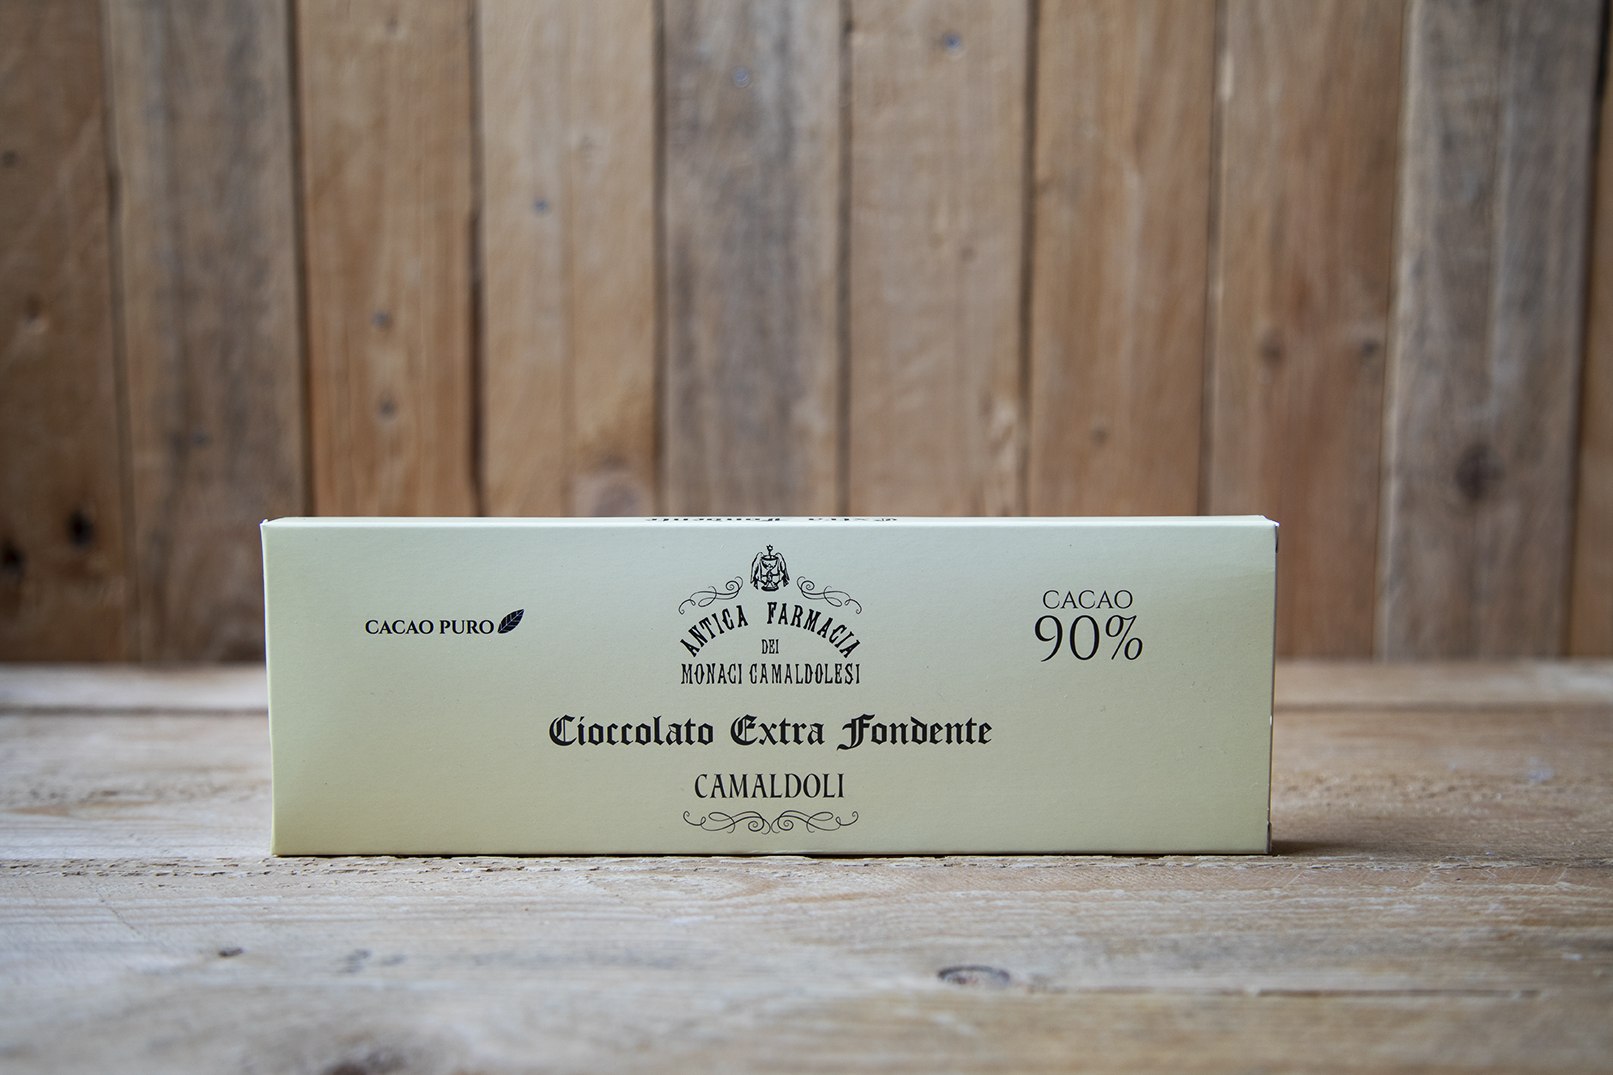 Cioccolato extra fondente 90%